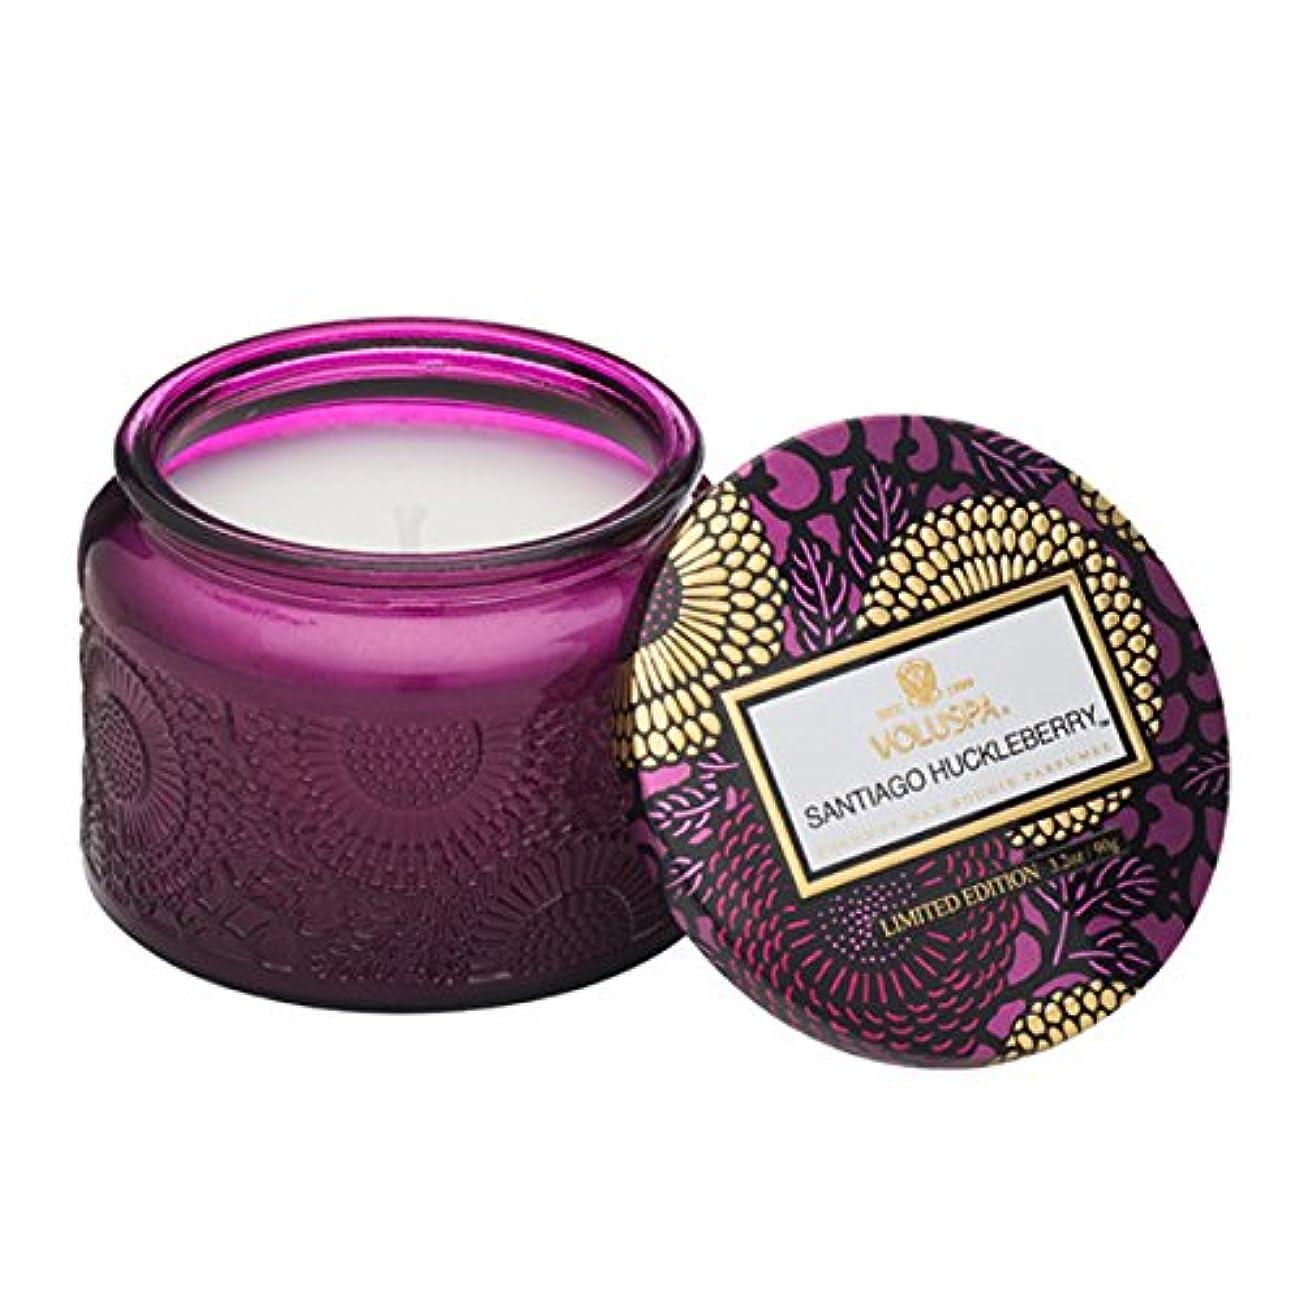 Voluspa ボルスパ ジャポニカ リミテッド グラスジャーキャンドル  S サンティアゴ ハックルベリー SANTIAGO HUCKLEBERRY JAPONICA Limited PETITE EMBOSSED Glass jar candle